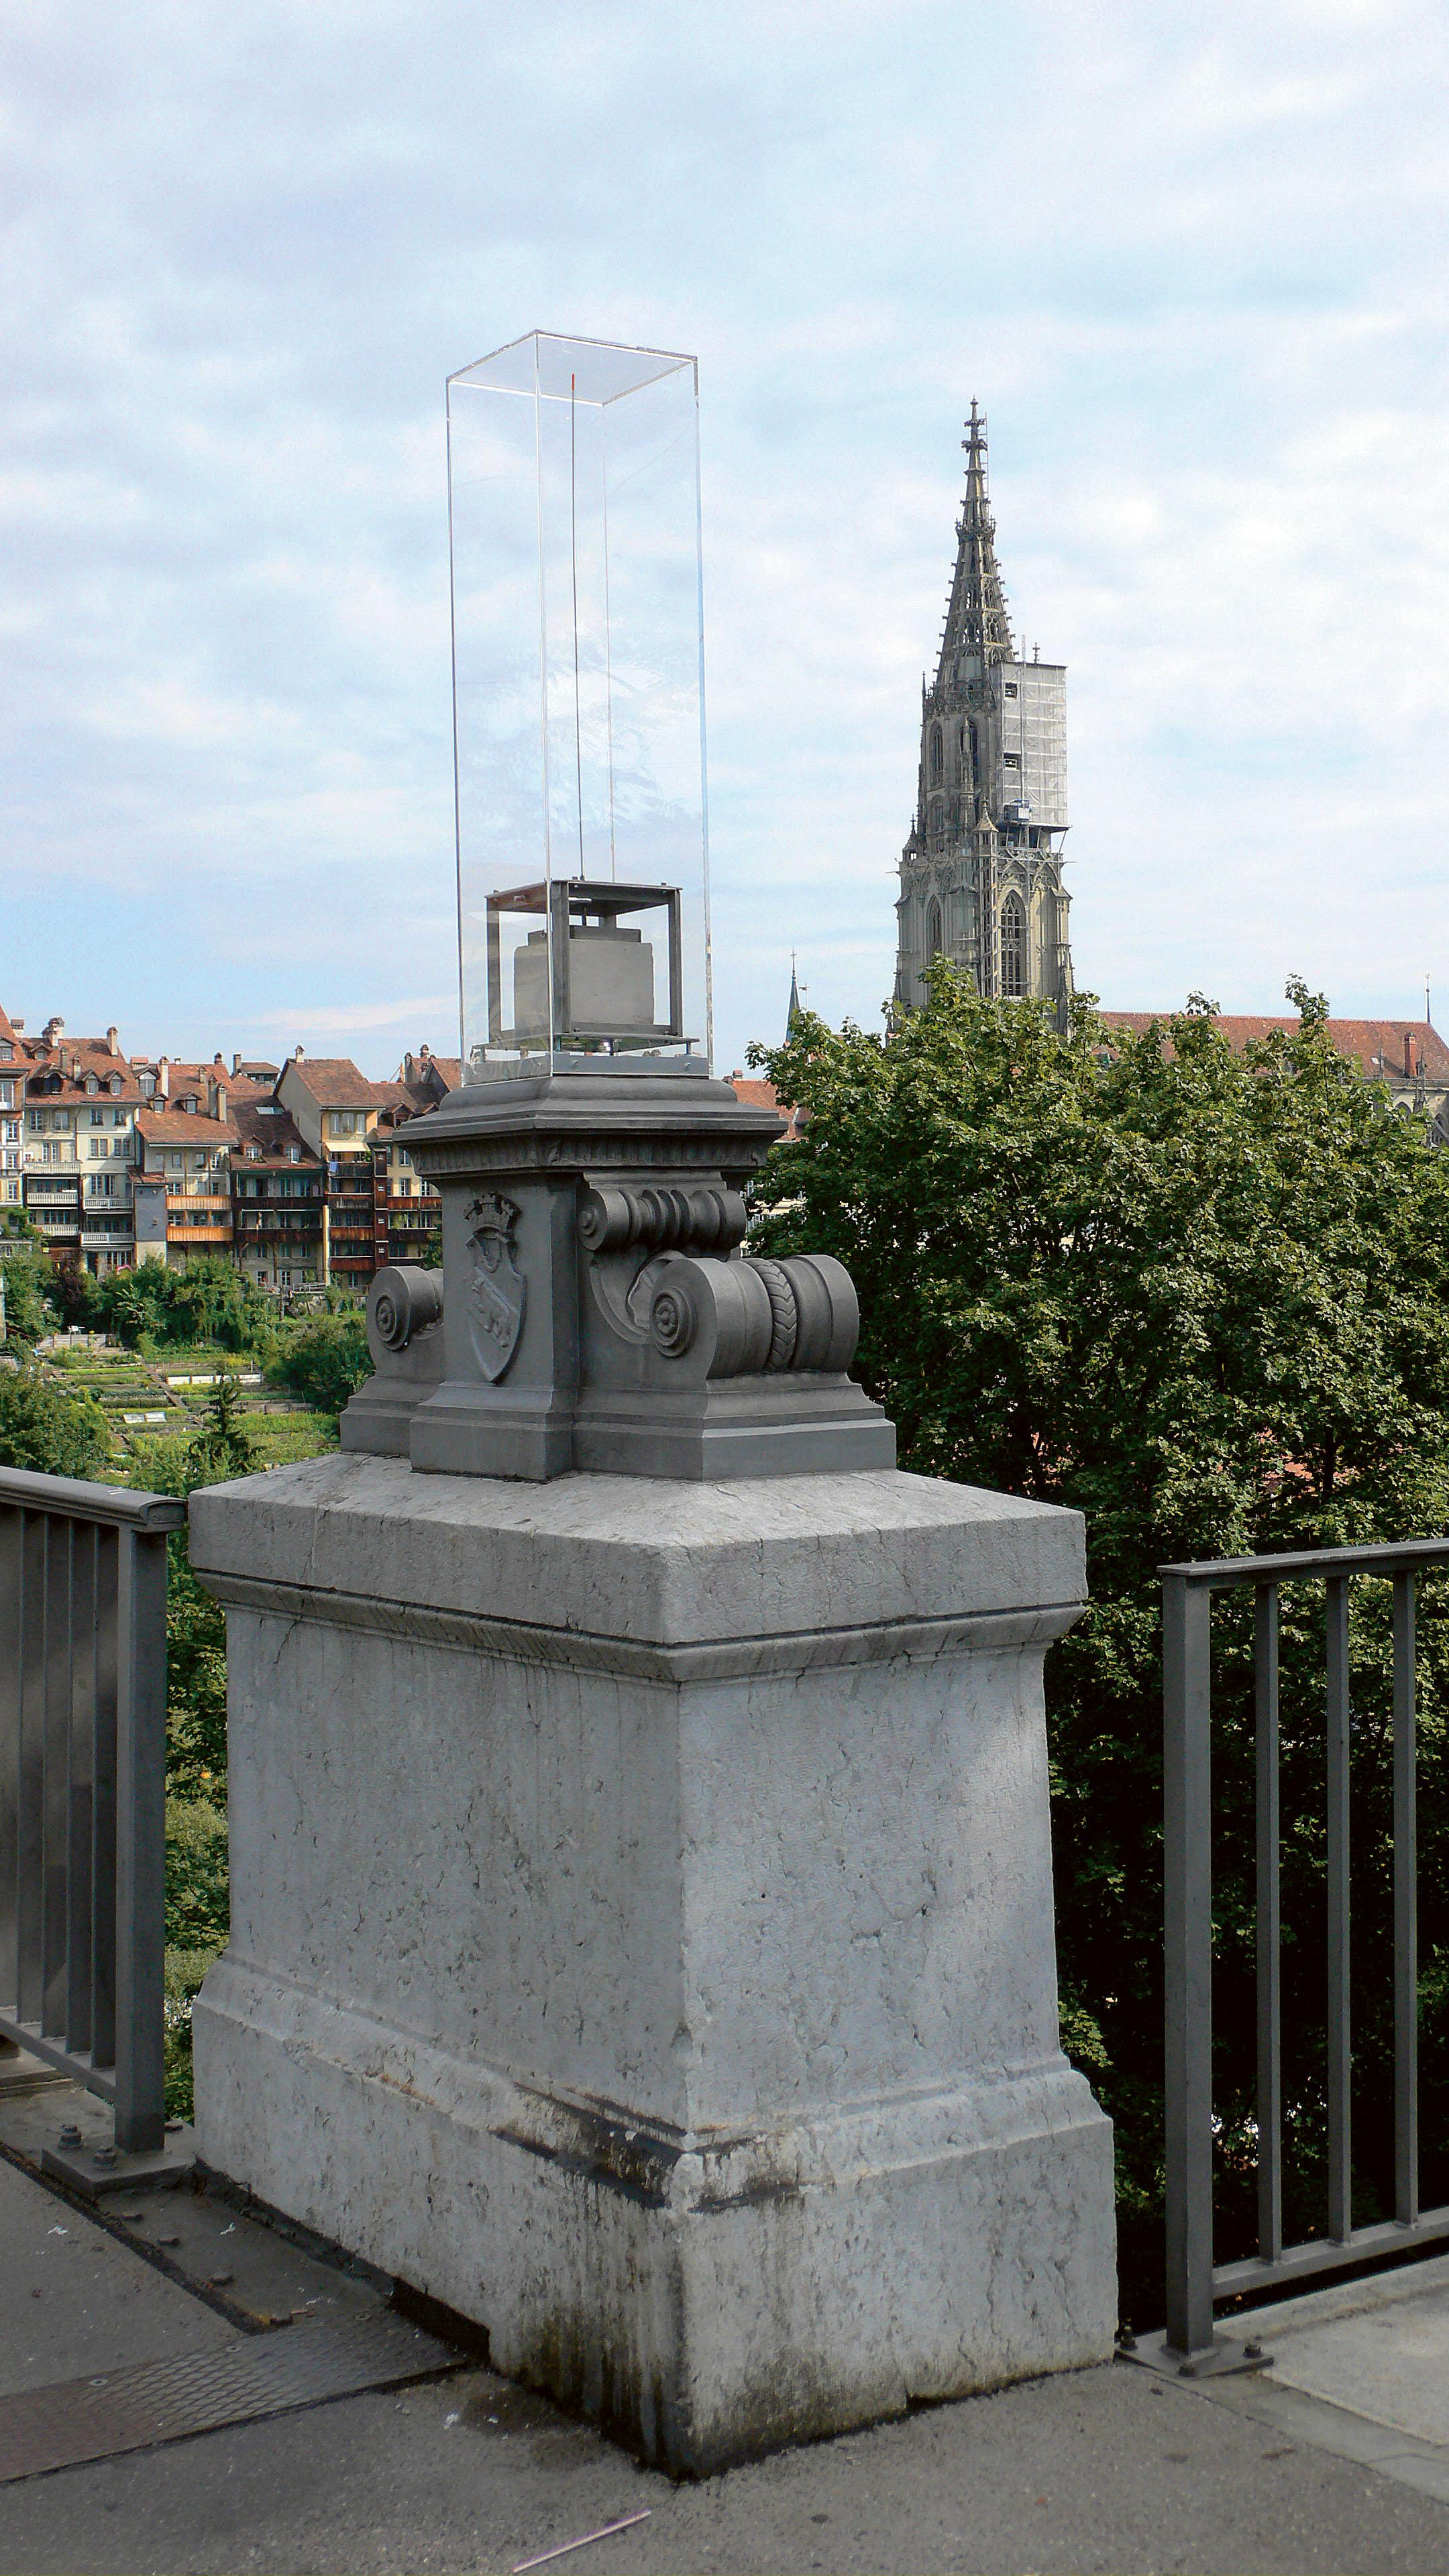 Der stille Portier, 2006. Image courtesy of Florian Dombois.